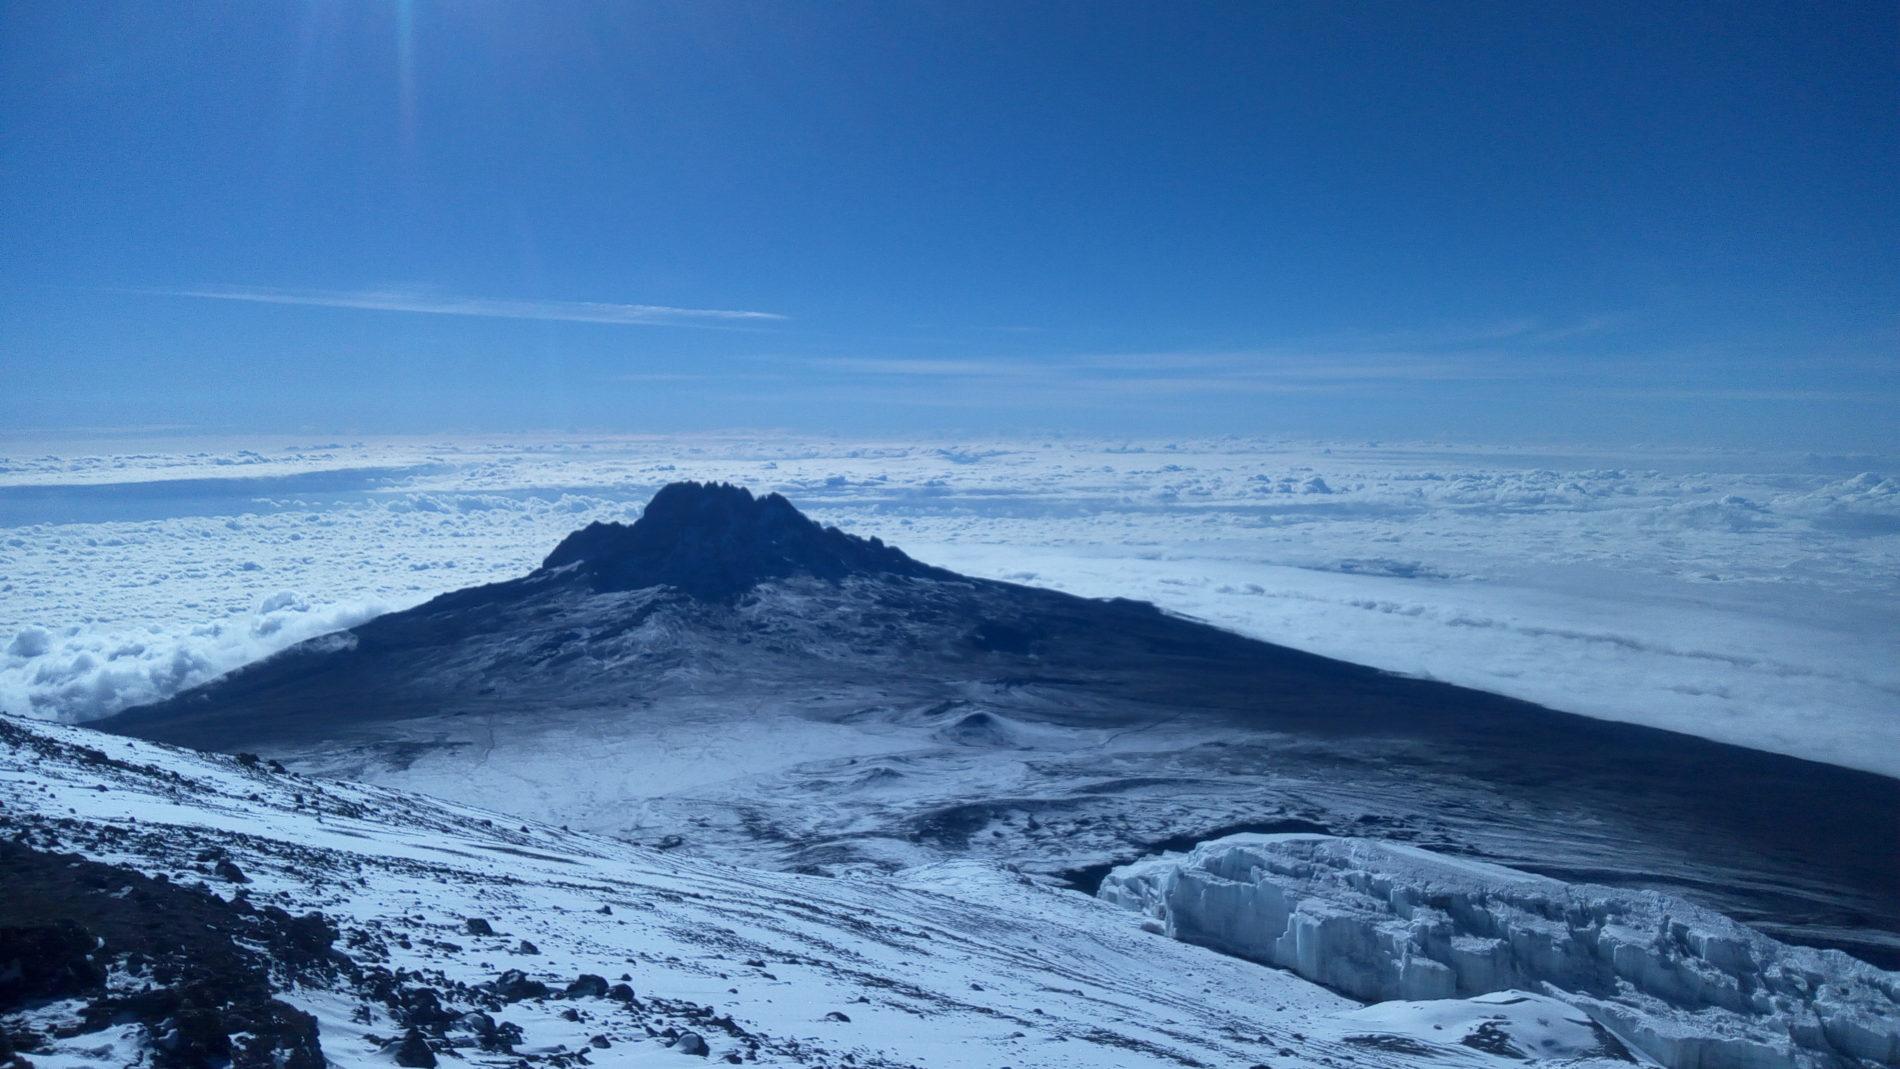 Kilimanjaro climb snow cap